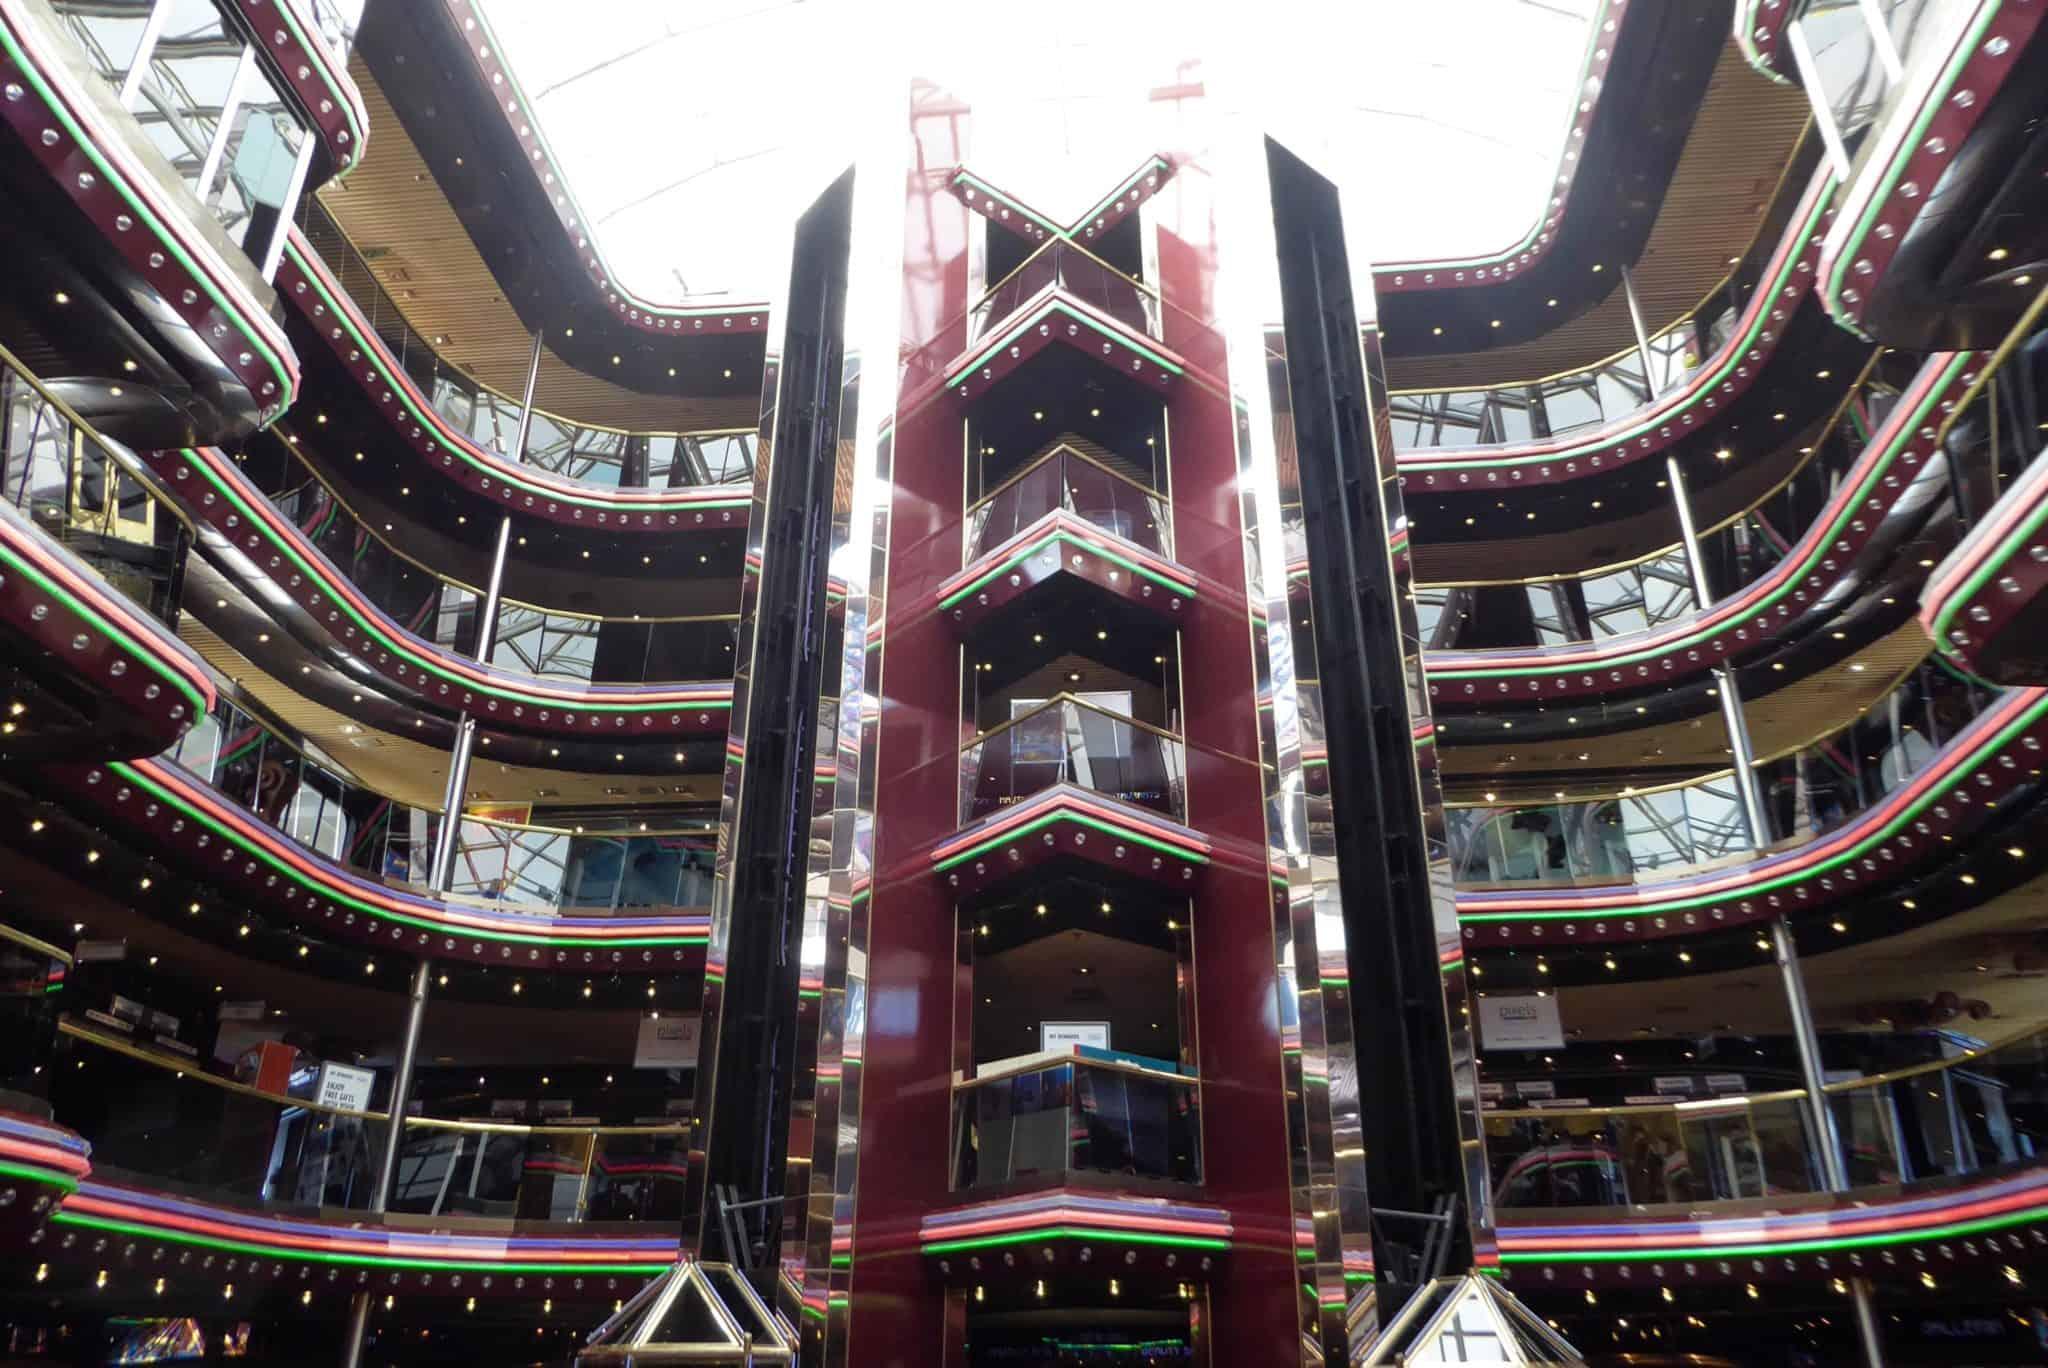 carnival inspiration ship atrium